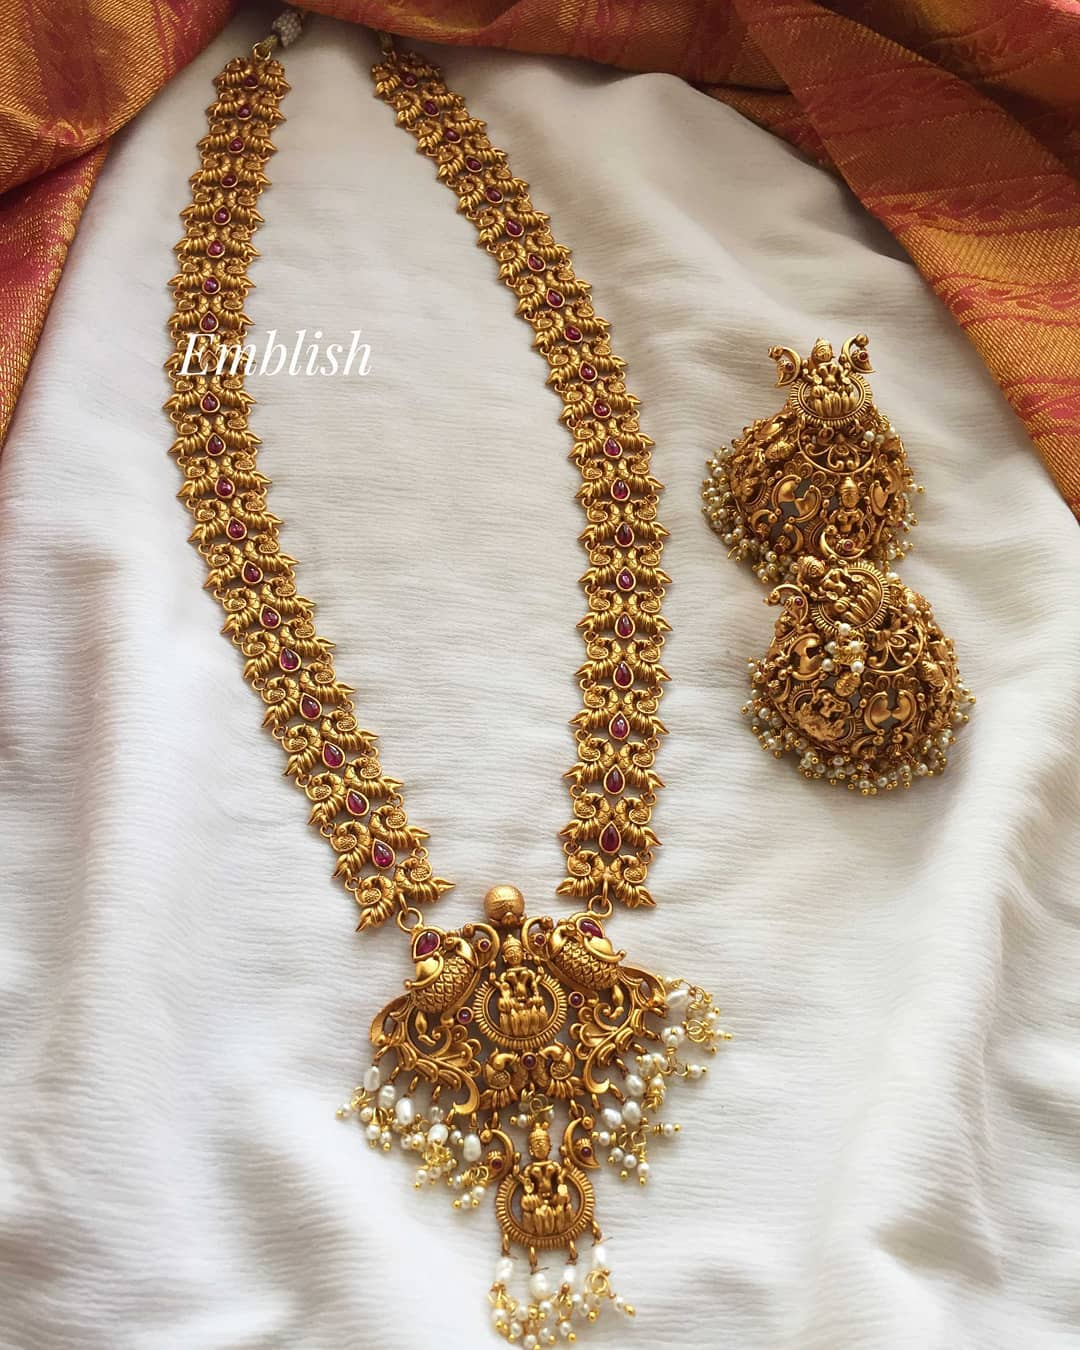 Matt-Finish-Imitation-Jewellery(7)